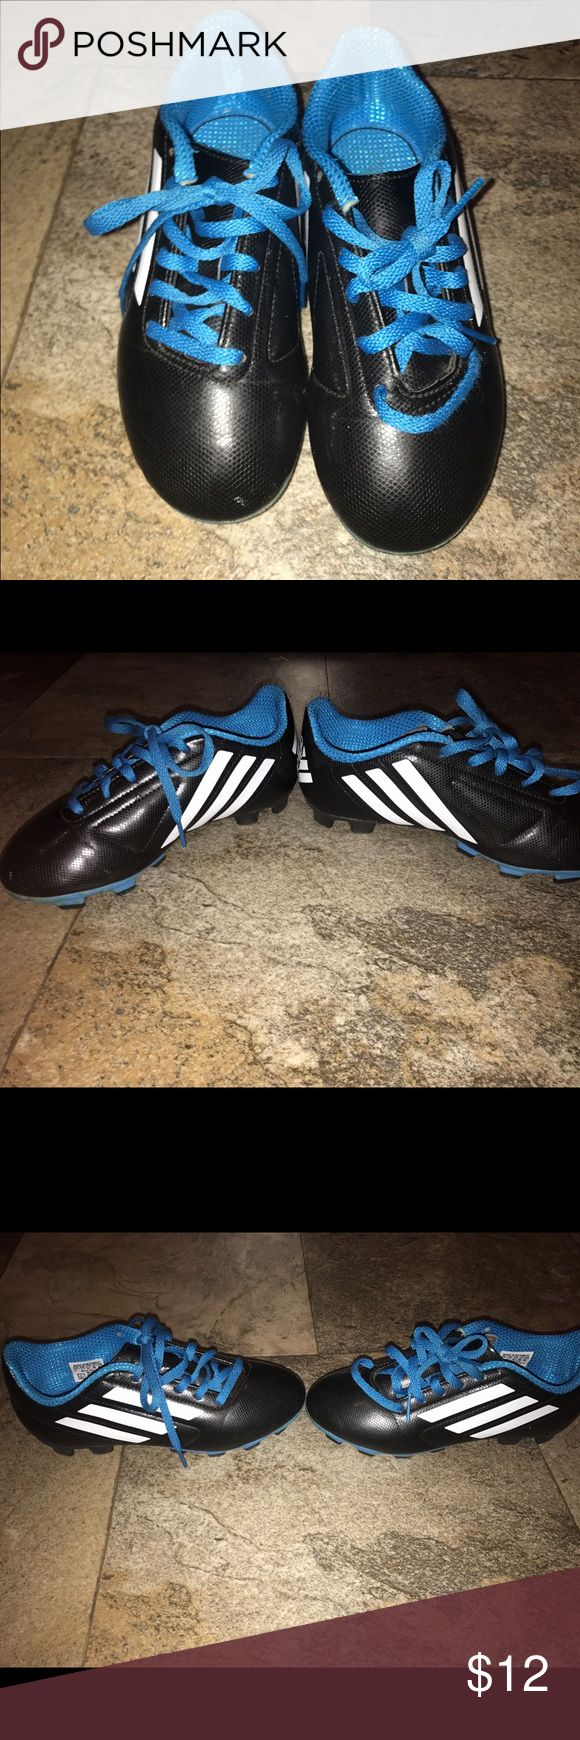 Adidas kids soccer cleats EUC size 2 Adidas kids soccer cleats EUC size 2 Adidas Shoes